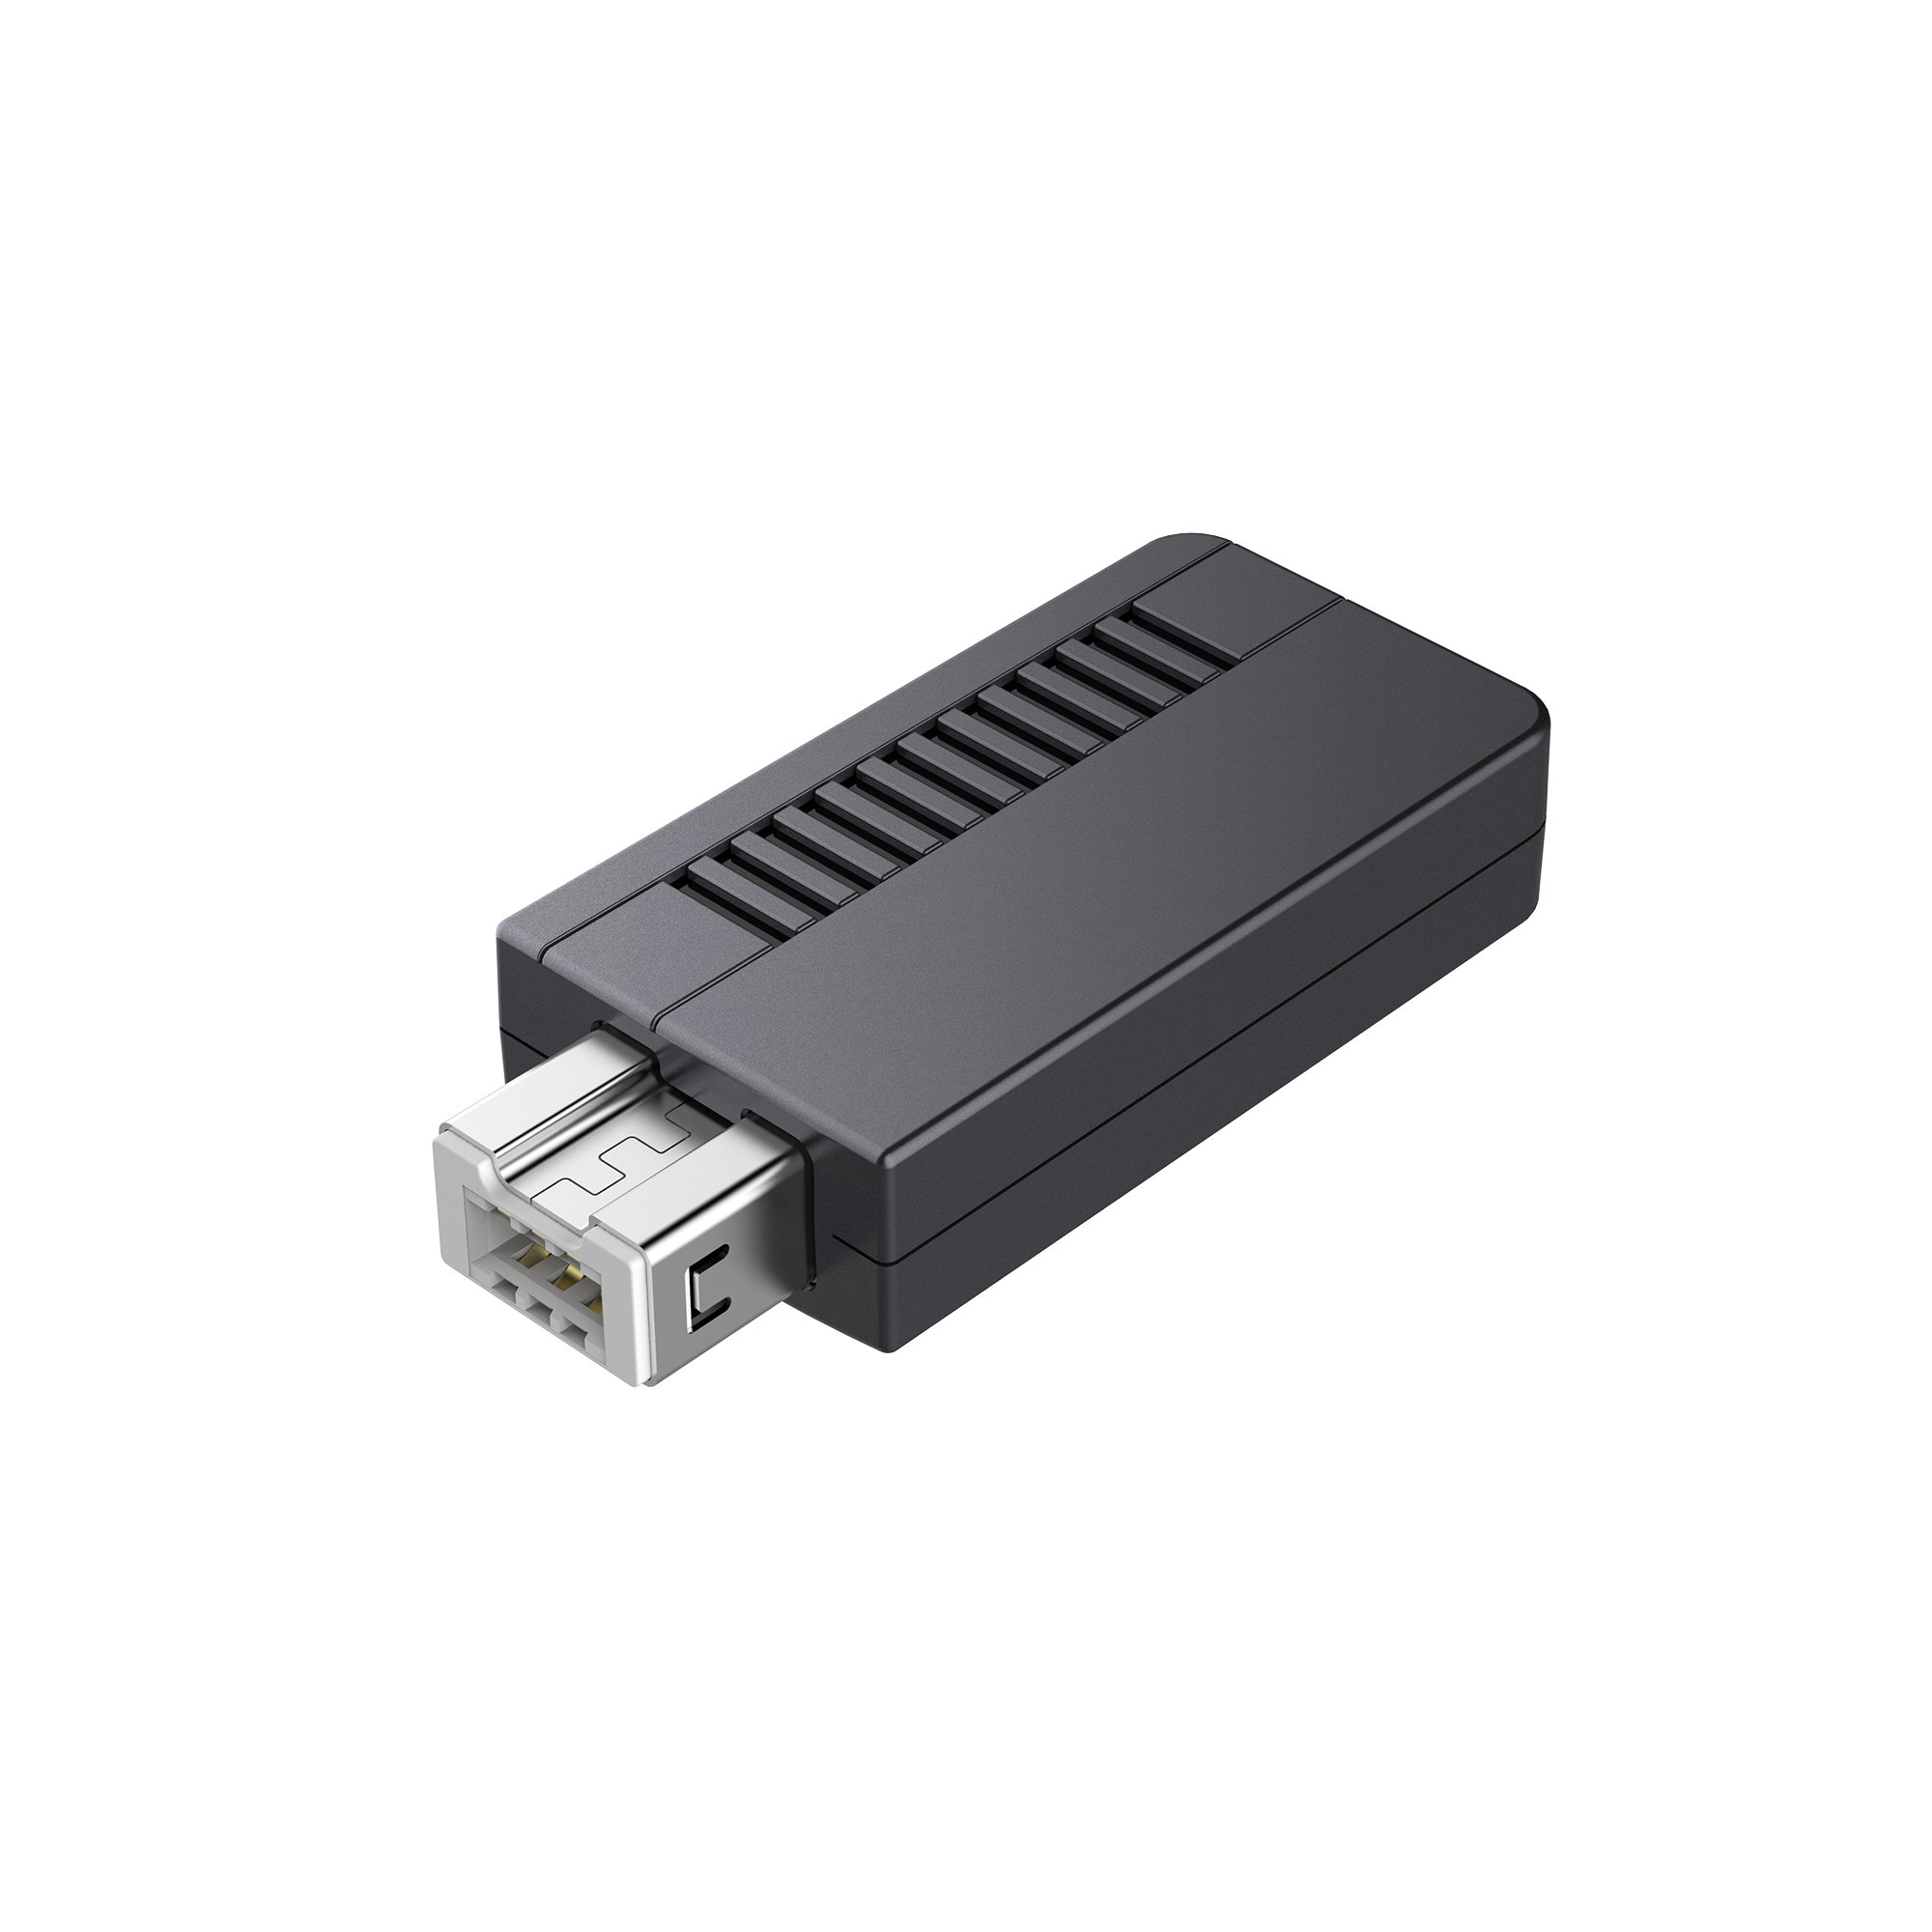 8Bitdo SN30 2.4G Wireless Controller for SNES Classic Edition [nintendo_super_NES] by 8Bitdo (Image #7)